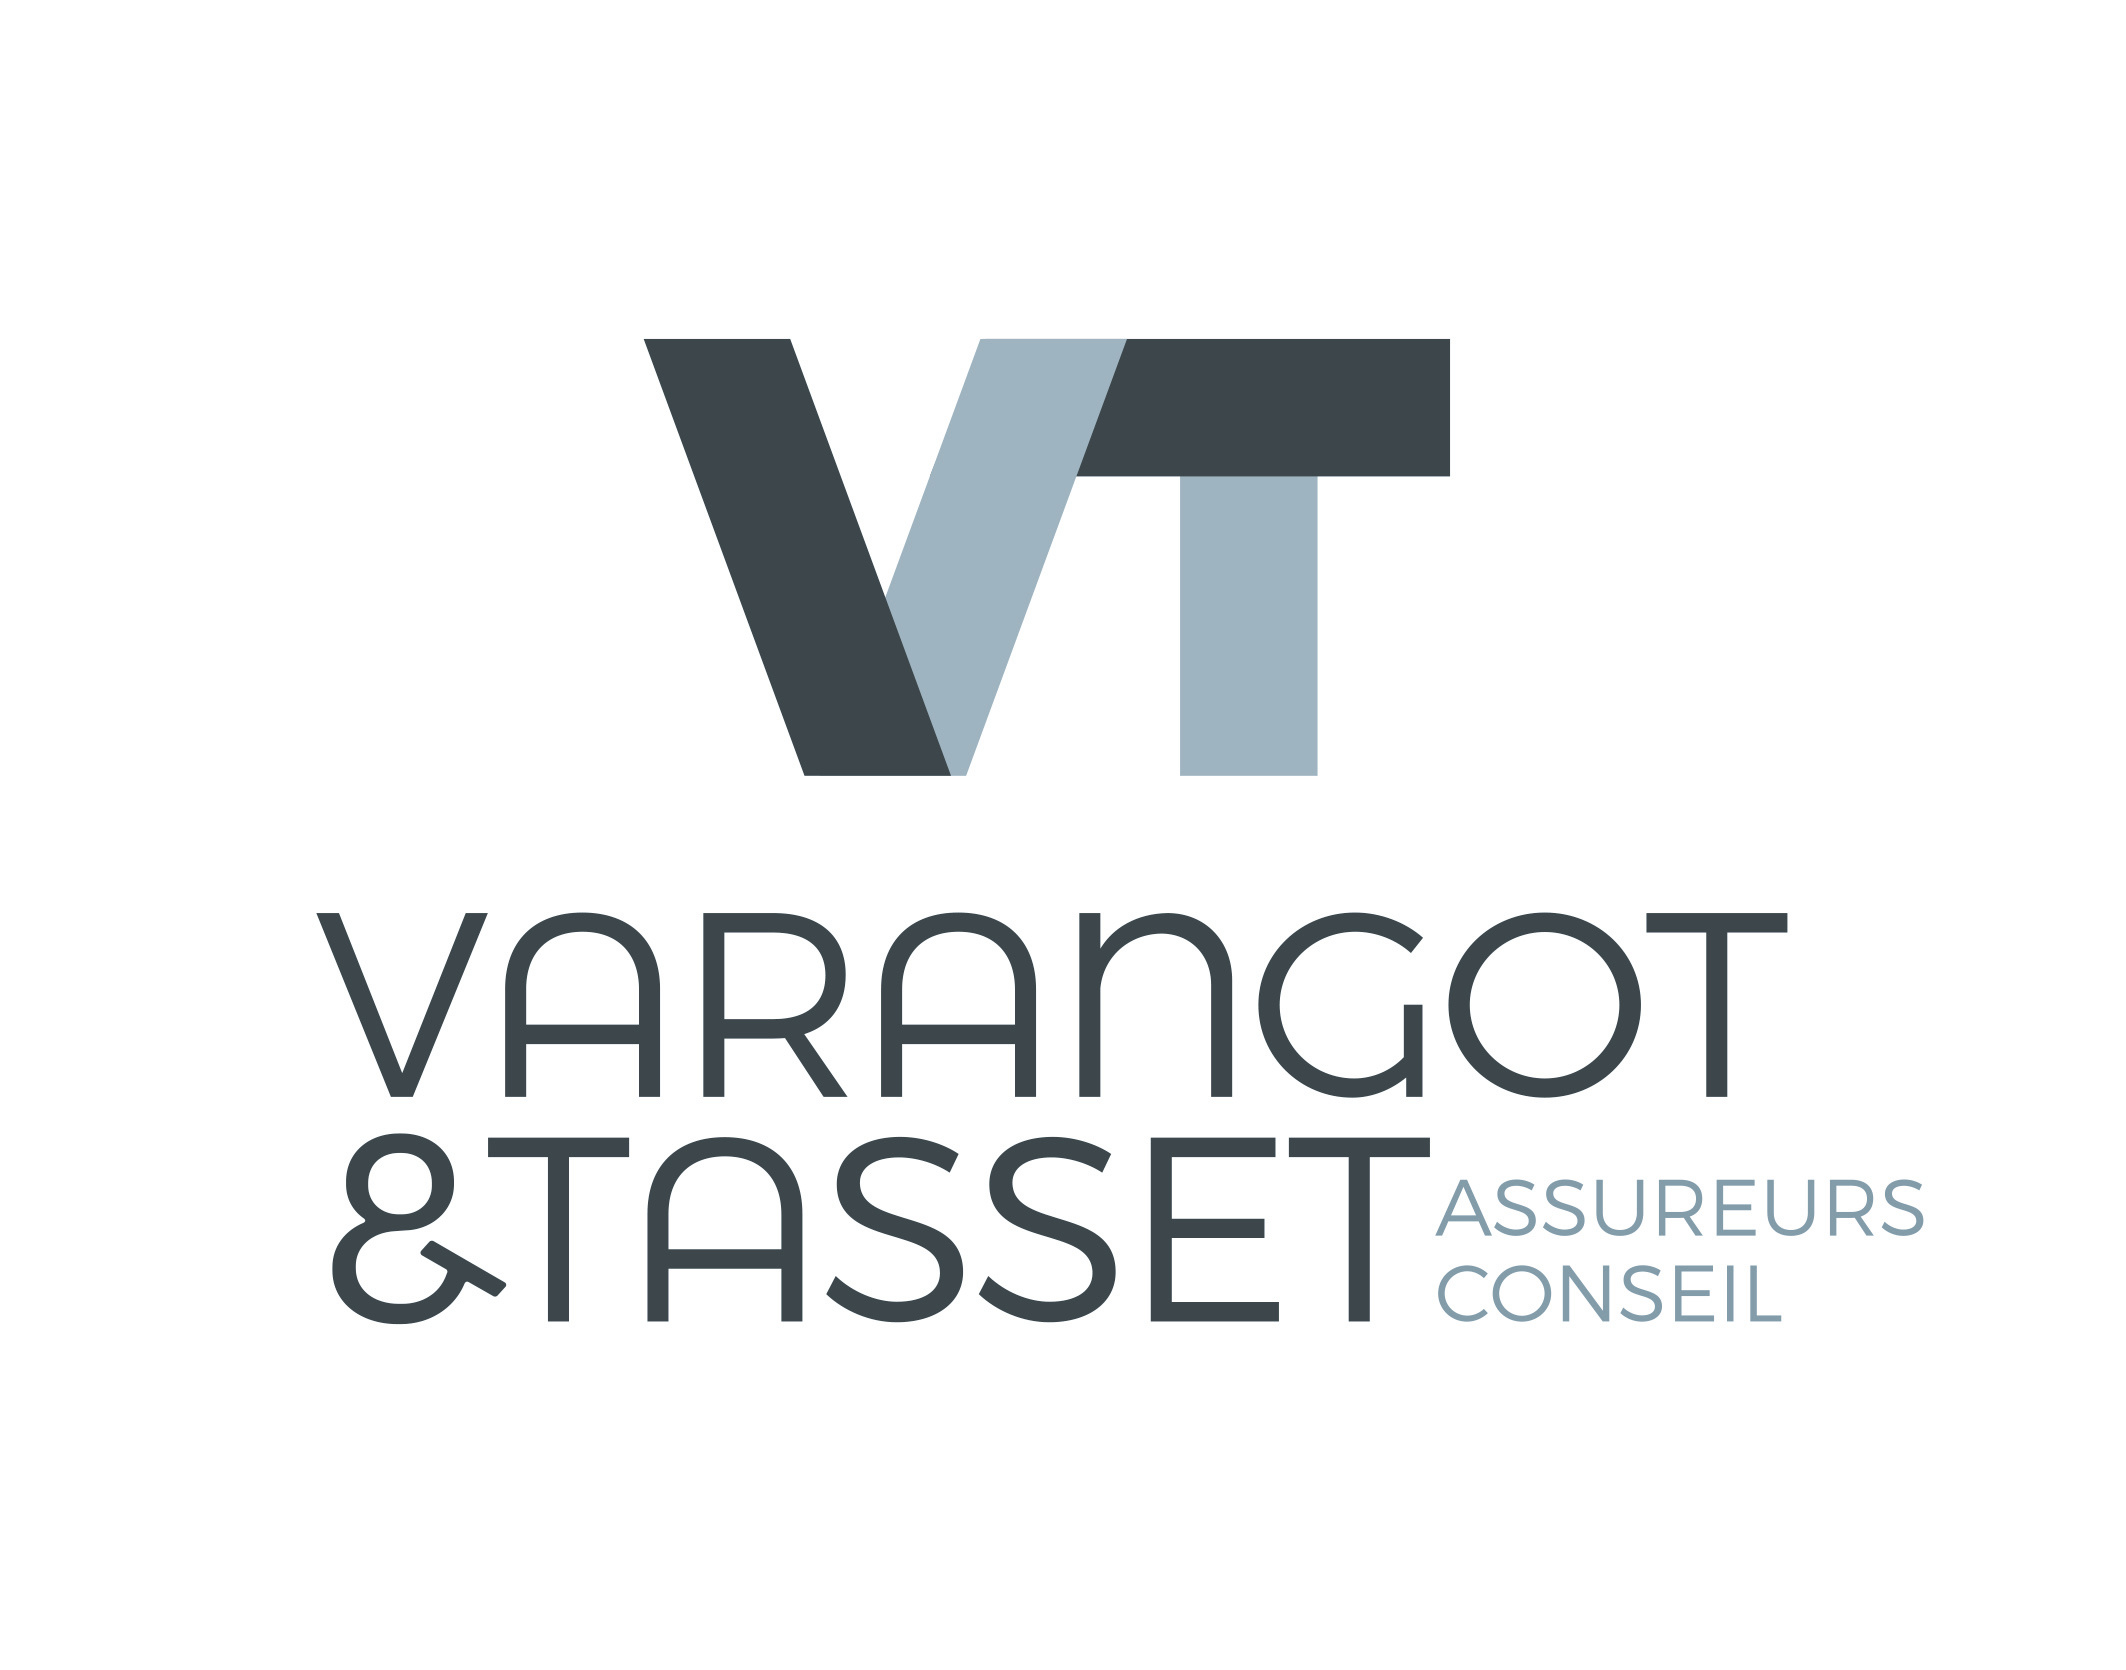 Varangot & Tasset